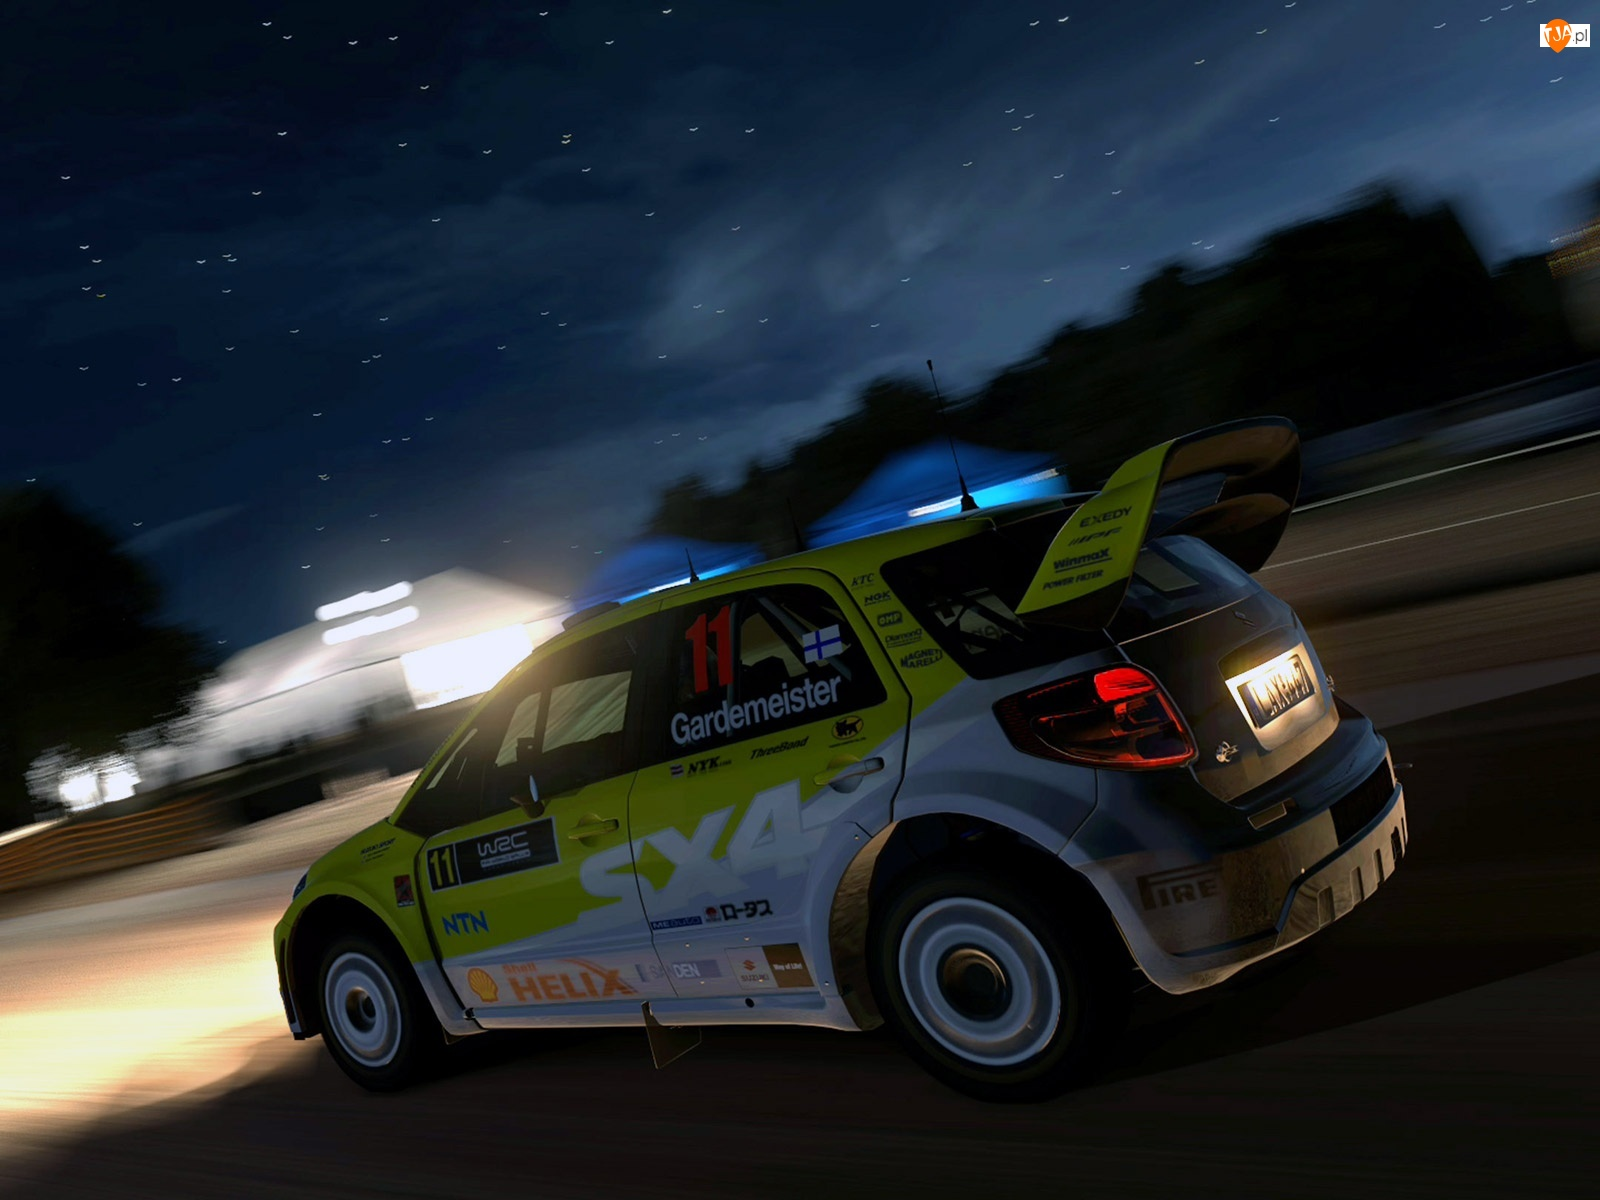 Rajd, Suzuki SX4, Nocny